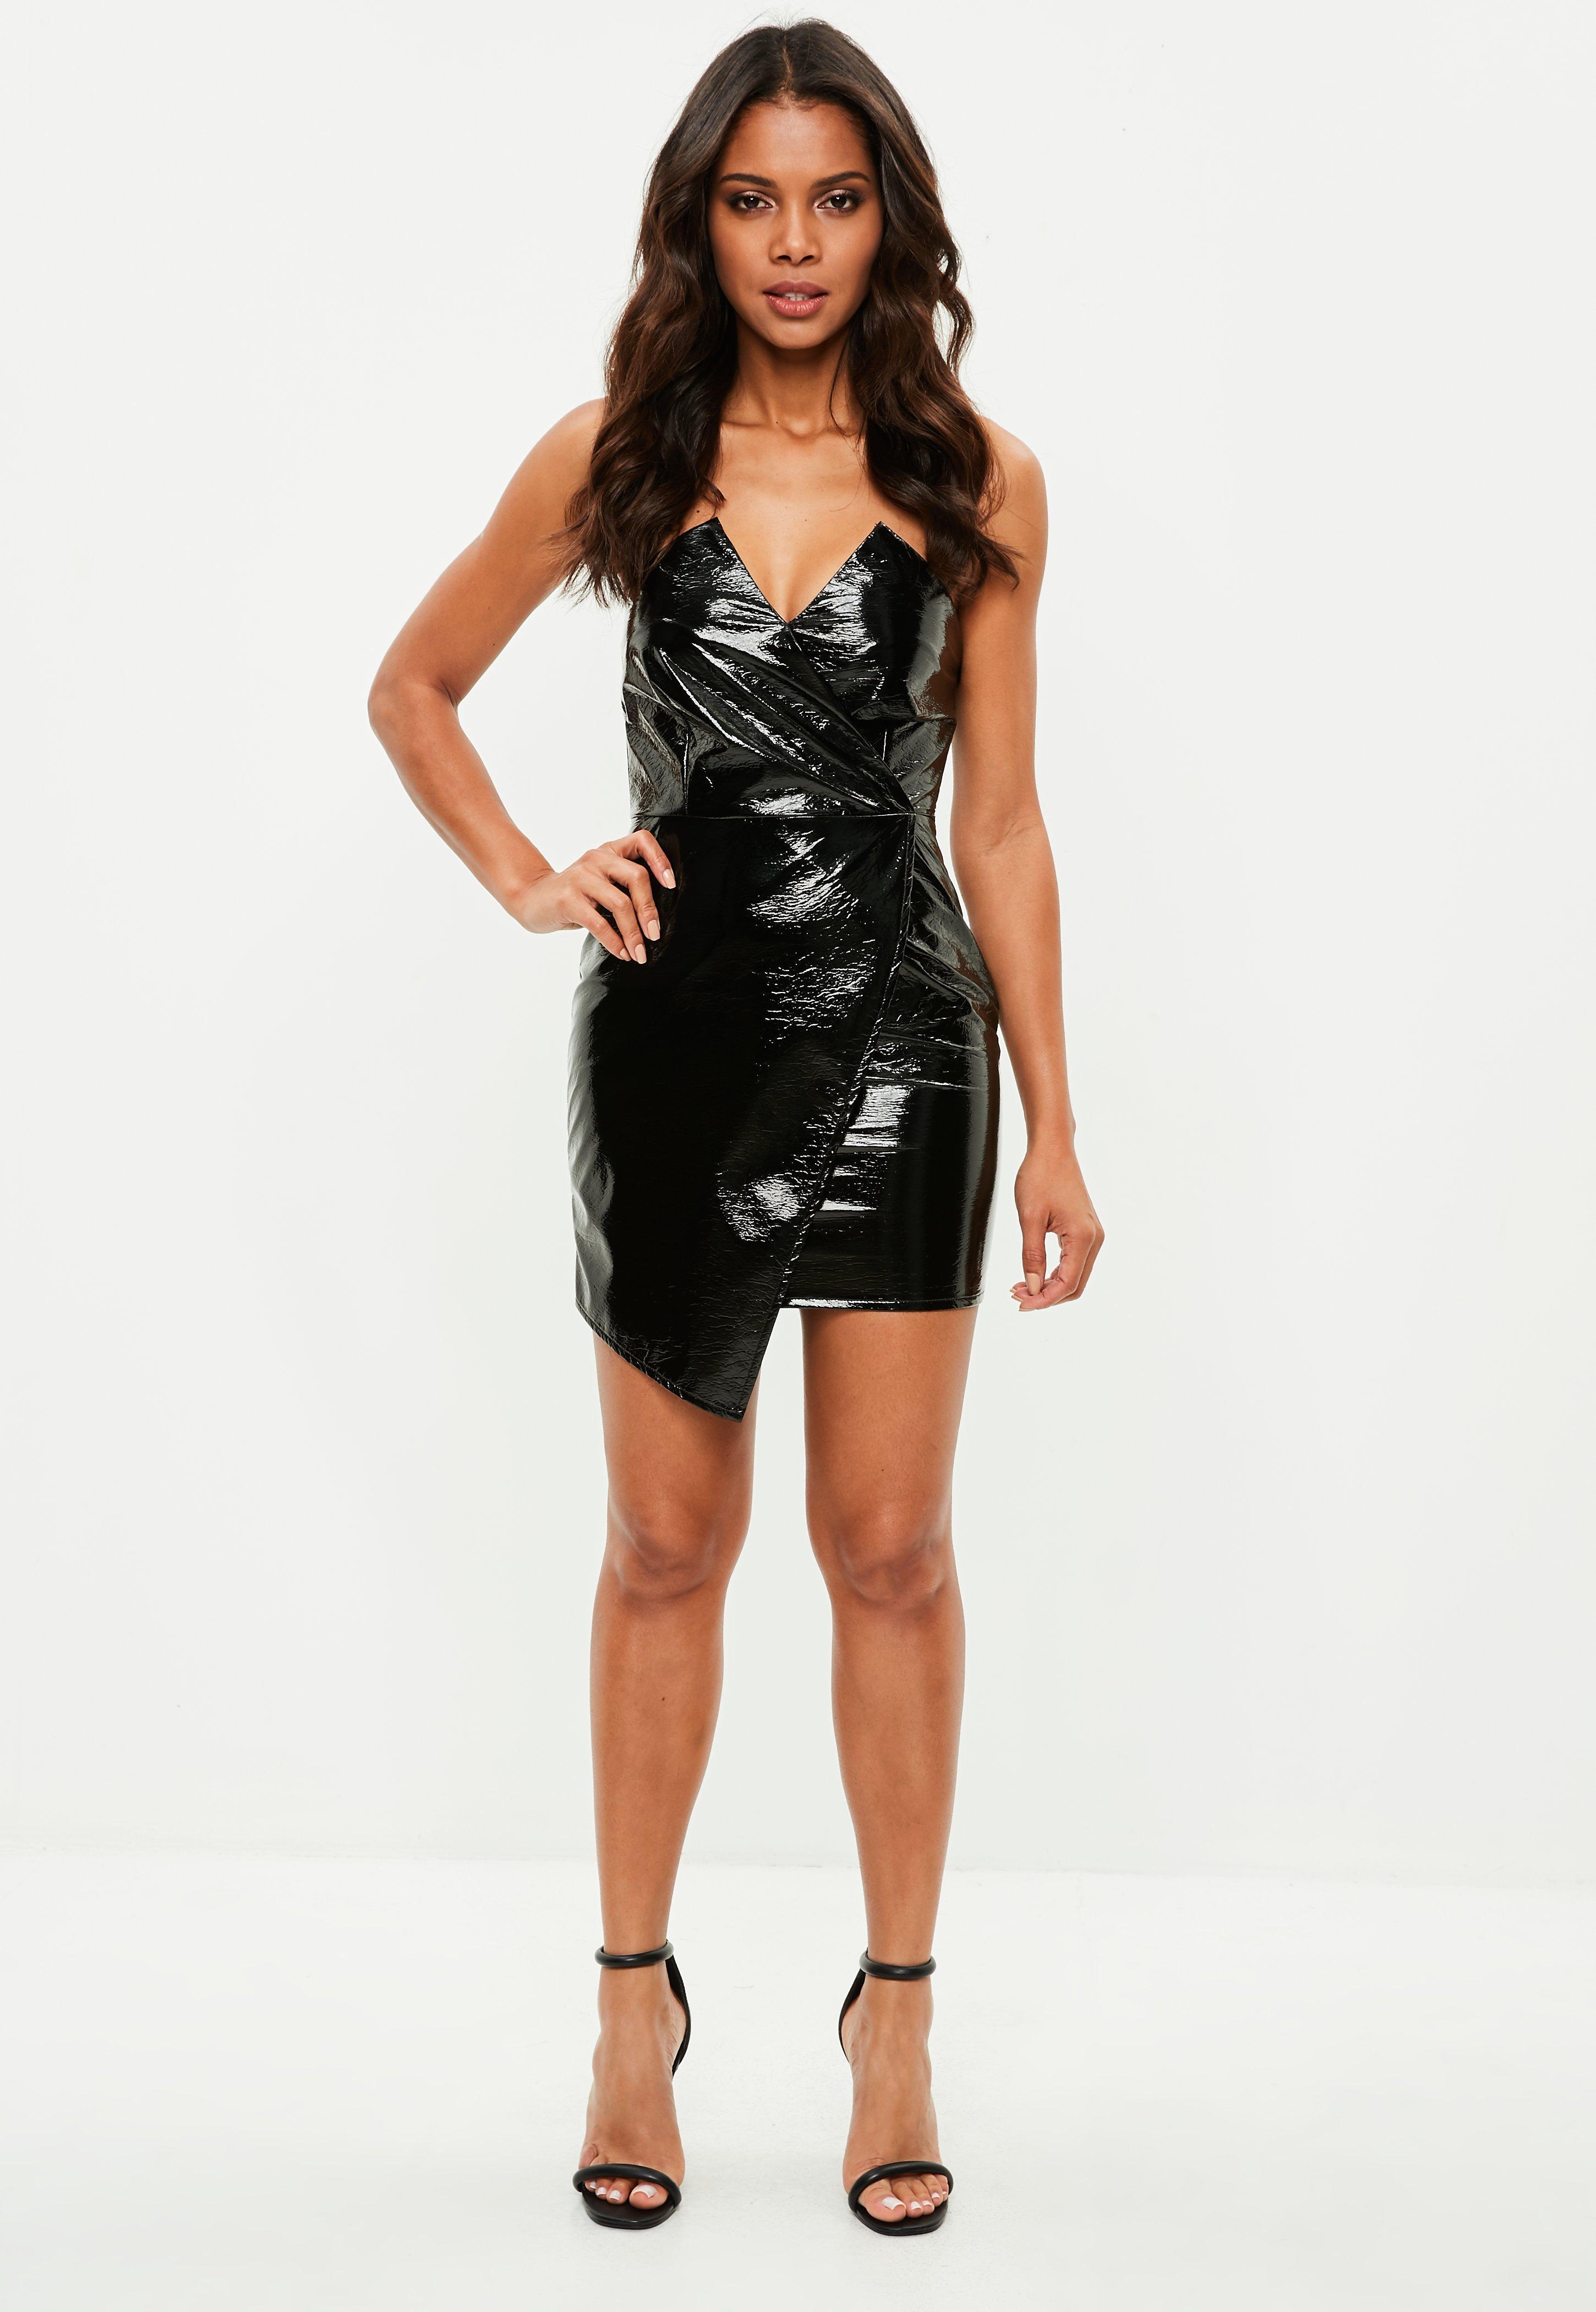 adc4ae4a909 Missguided Petite Black Vinyl Bandeau Mini Dress - Unidays in Black ...